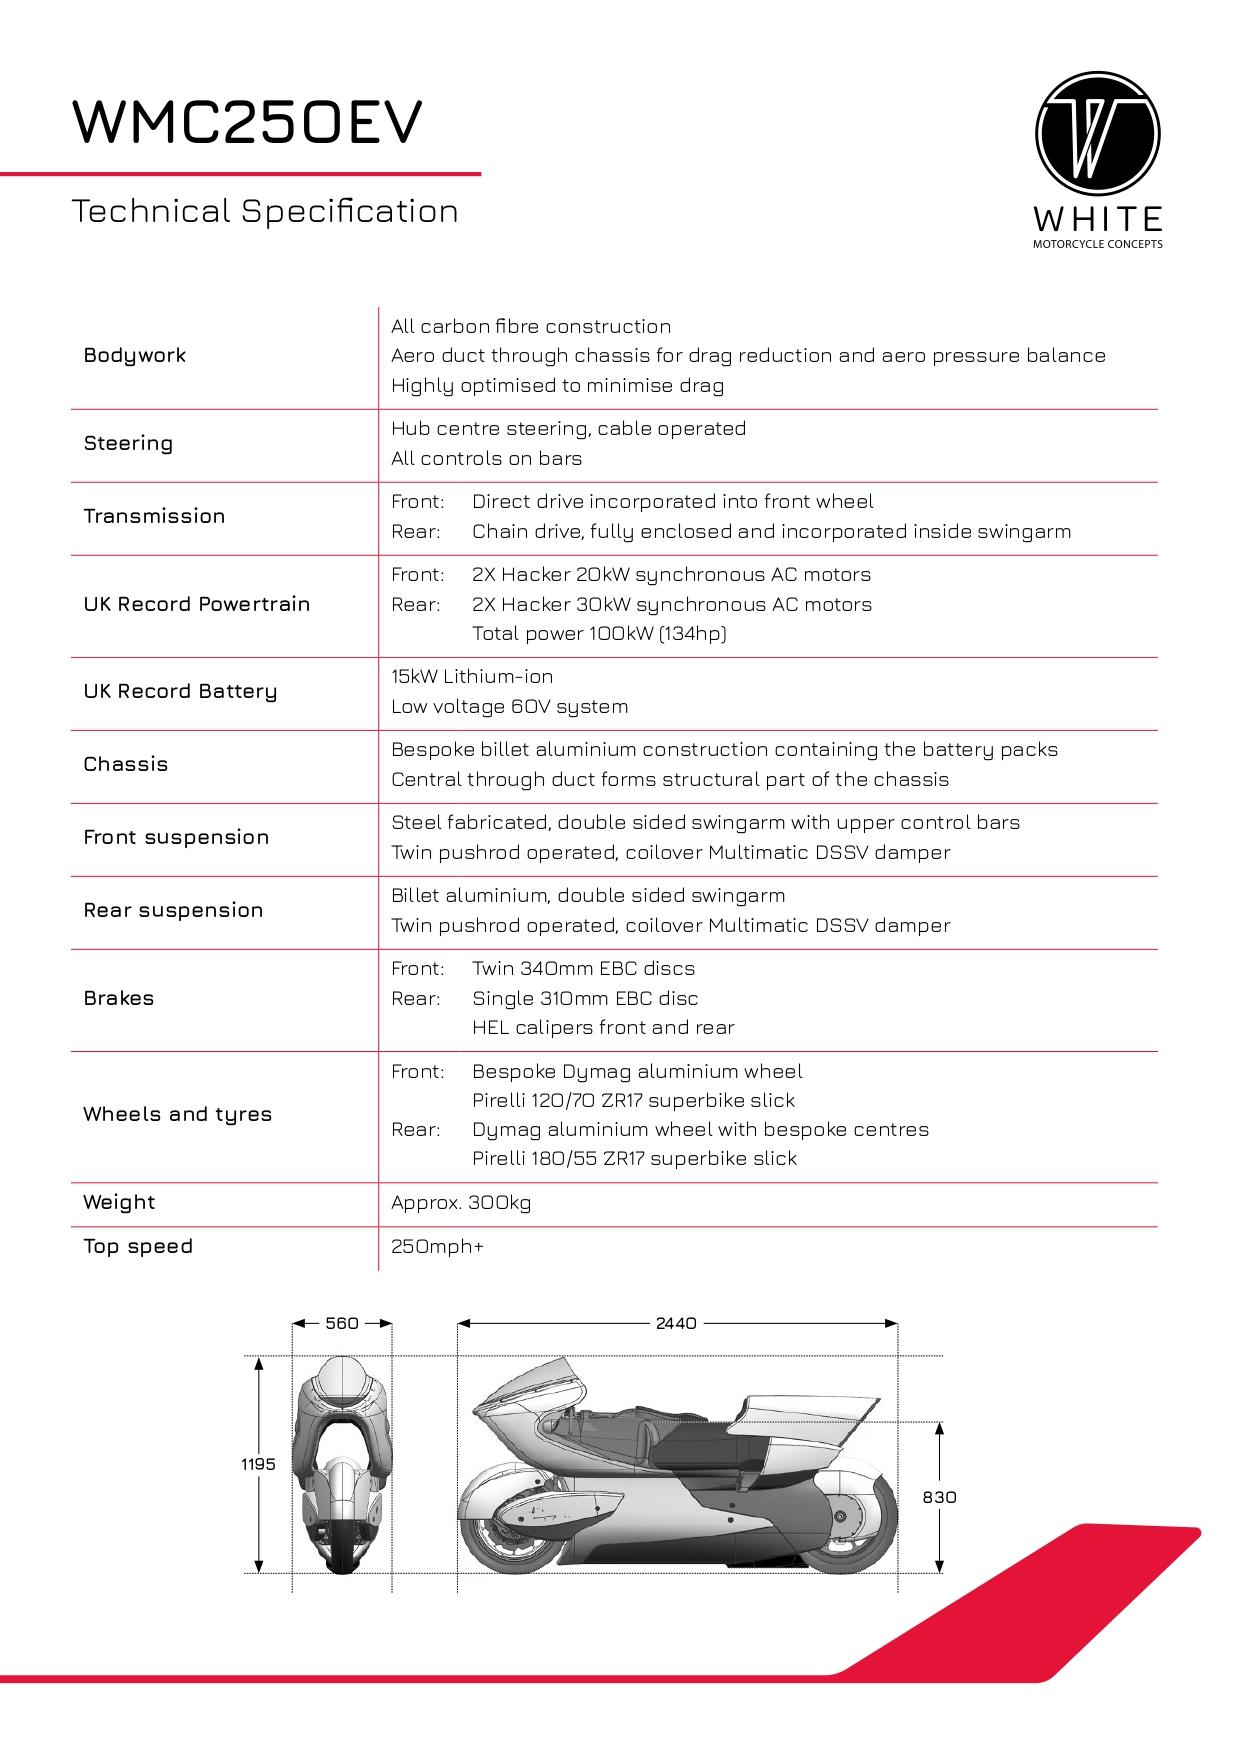 Motos Zéro CO2 : mission One, motoCzysz, mission R ... - Page 7 WMC250EV-Tech-Spec_page-0001